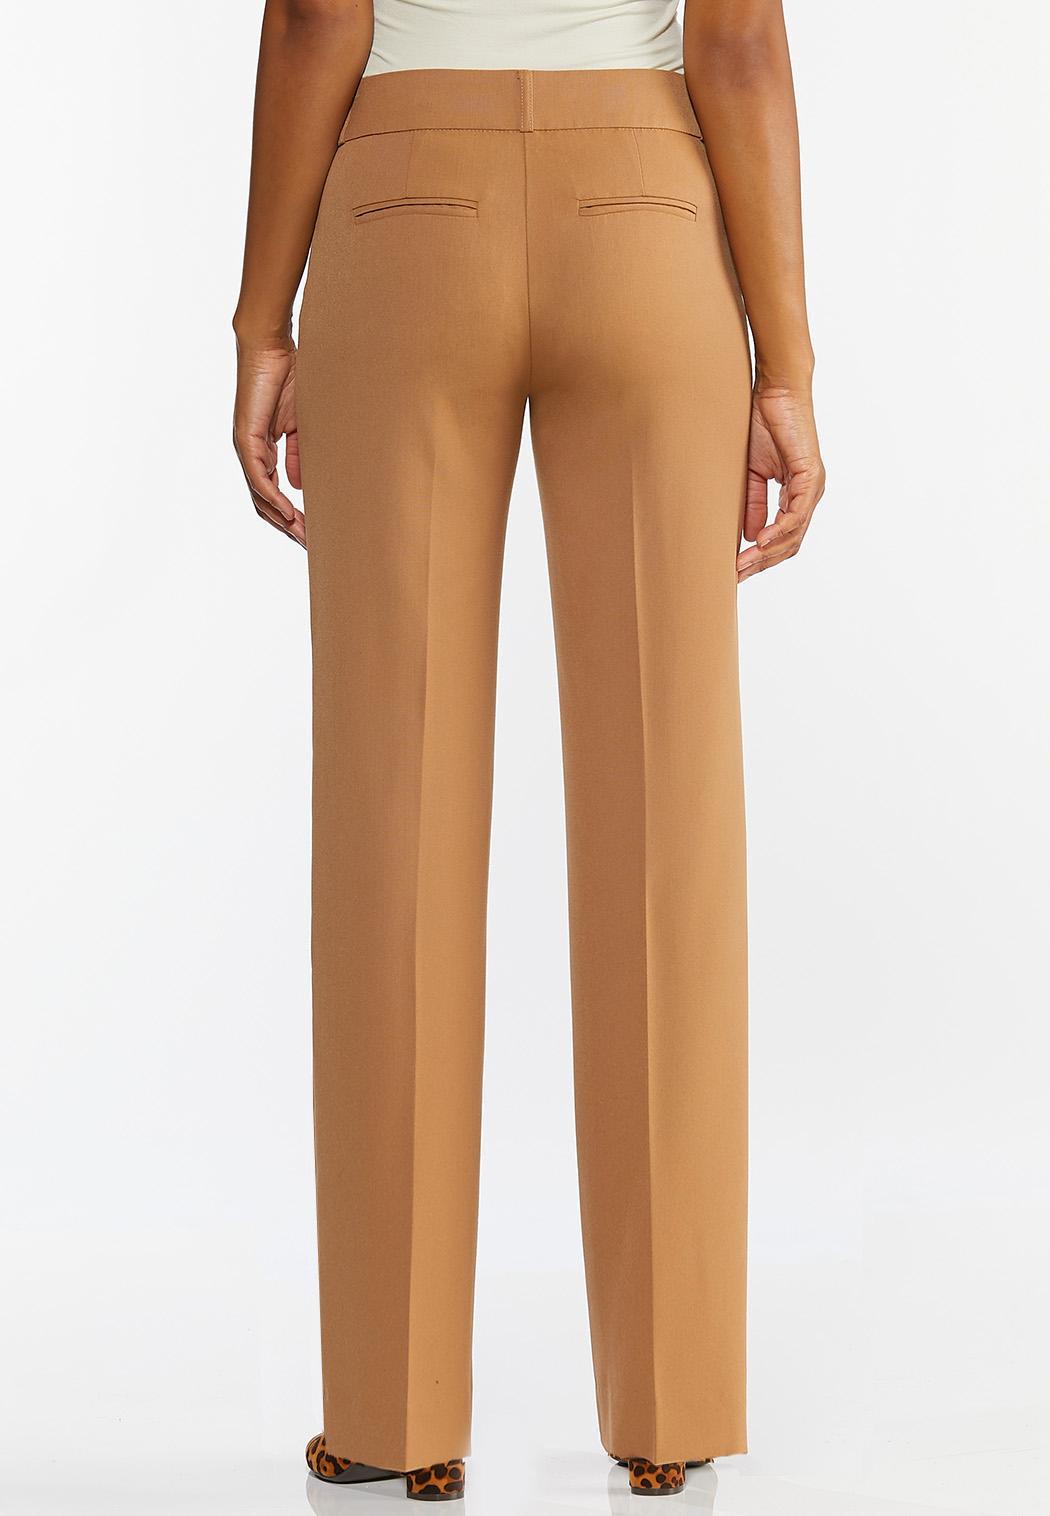 Stretch Waist Trouser Pants (Item #44380976)